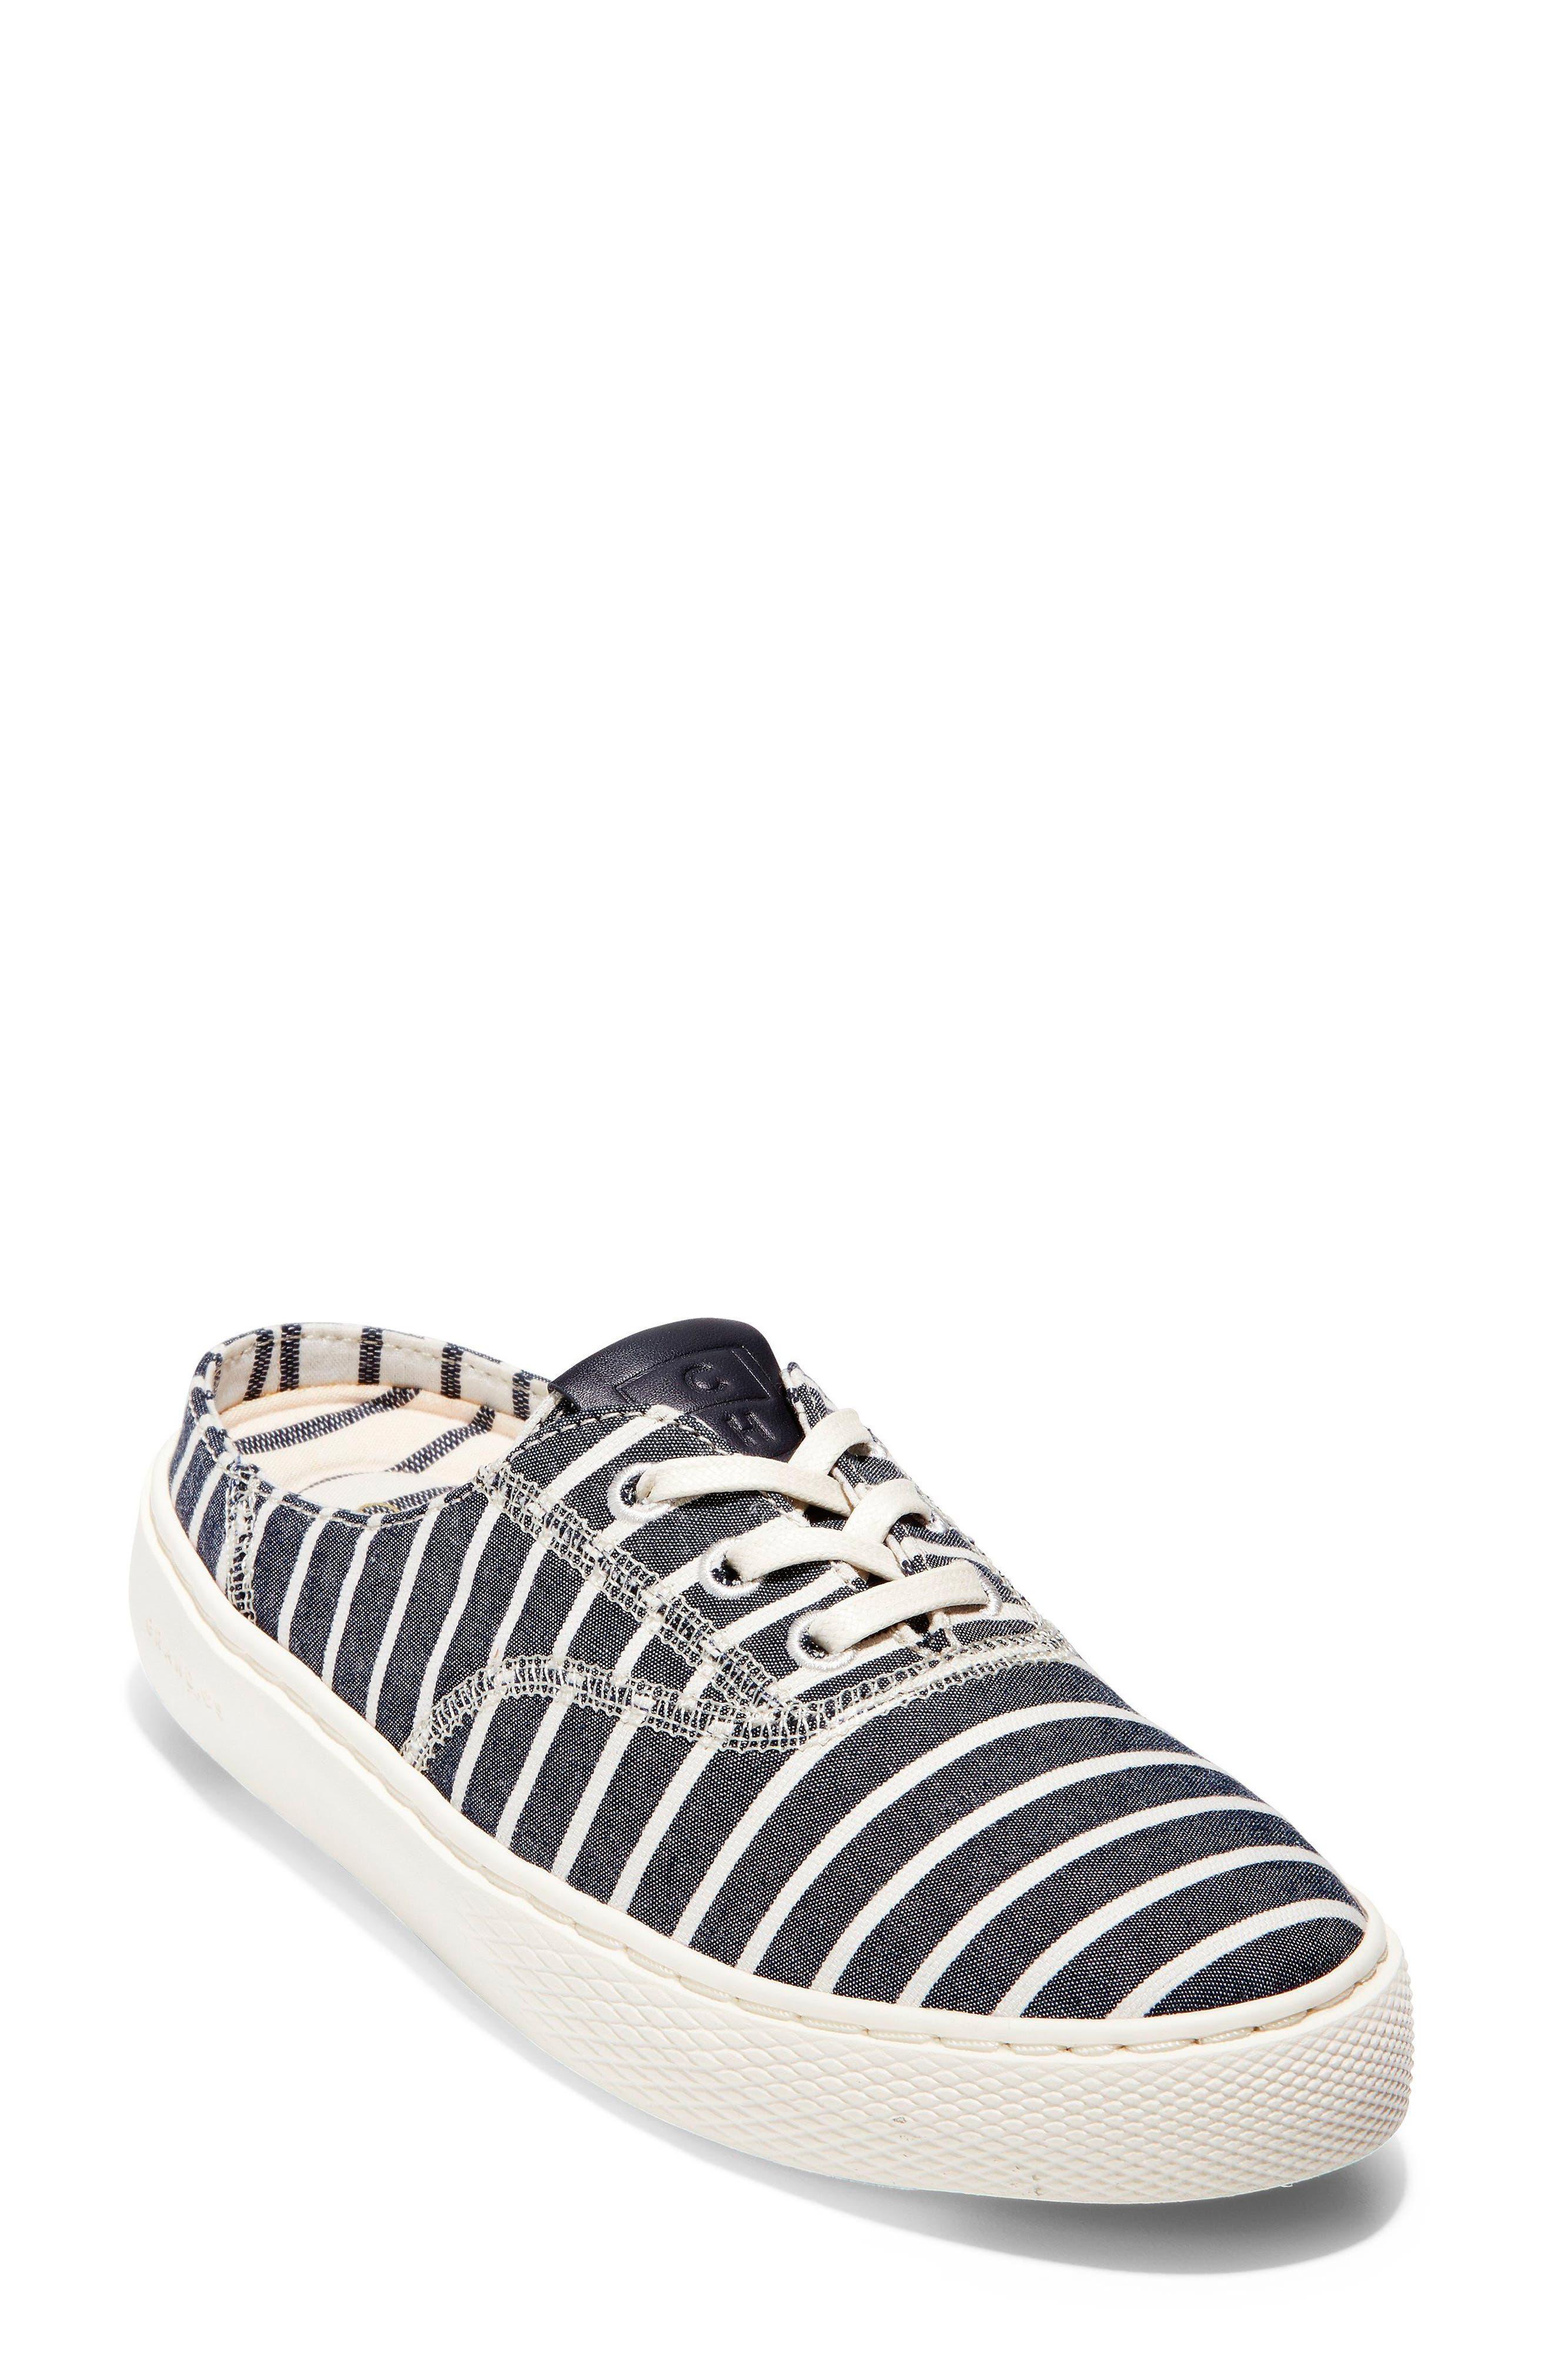 GrandPro Deck Sneaker,                             Main thumbnail 1, color,                             Freeport Stripe Fabric